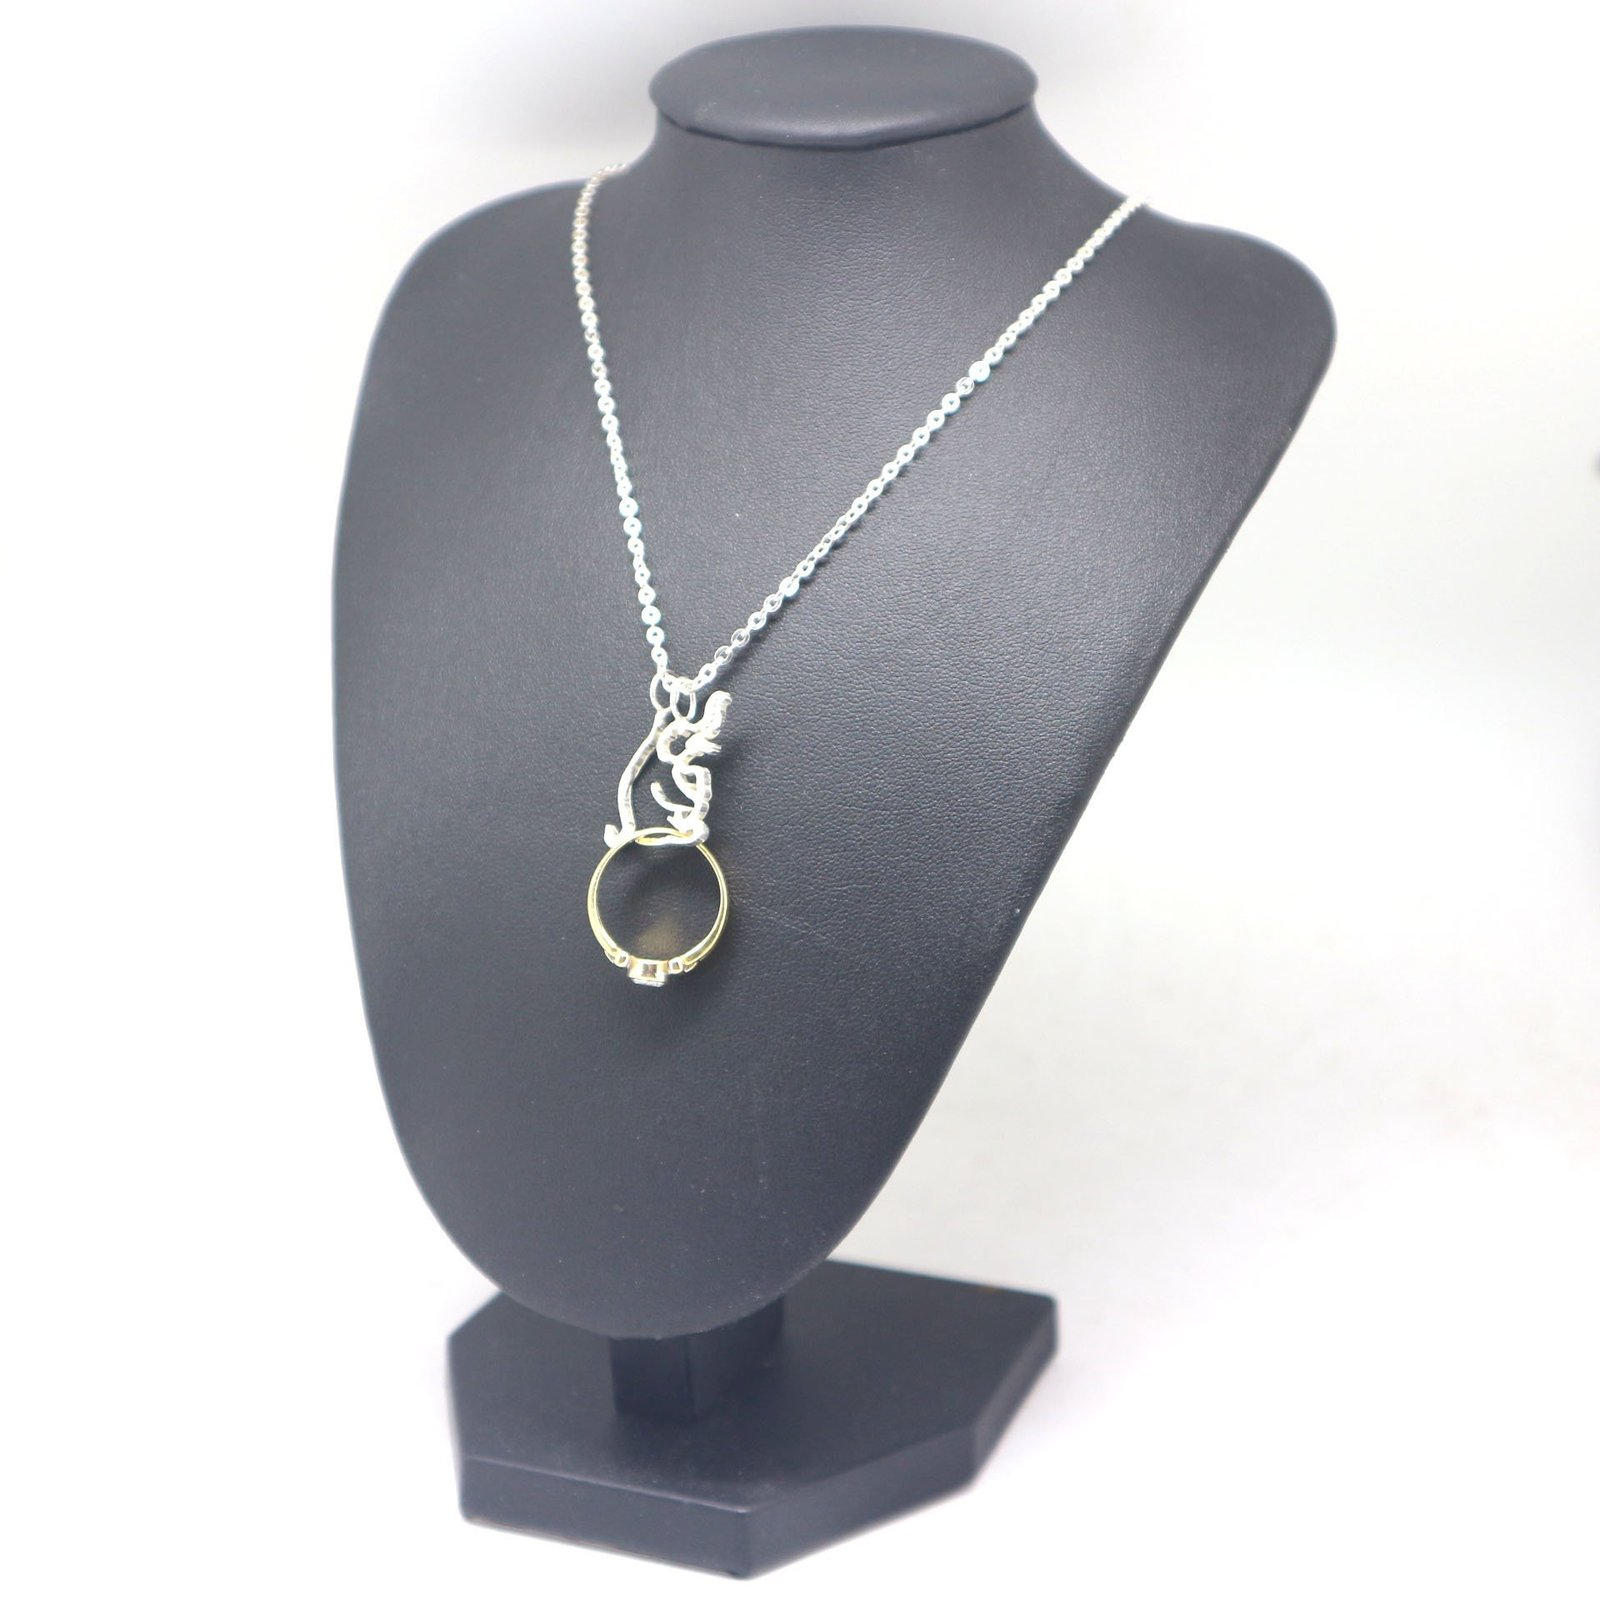 Silver Elephant Ring Holder Necklace Pendant image 5